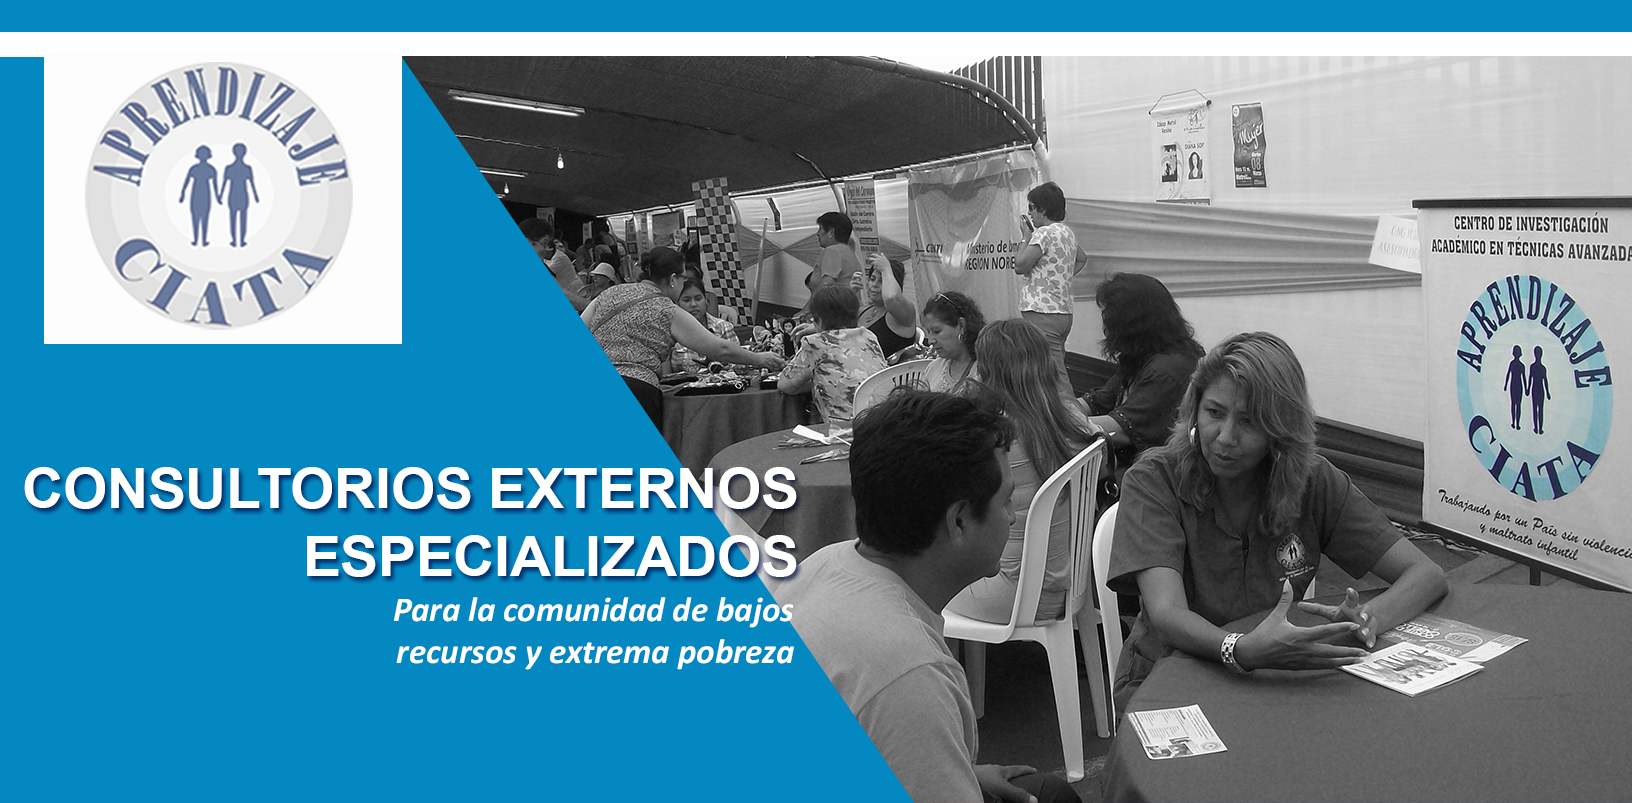 consultorios externos especializados (2)